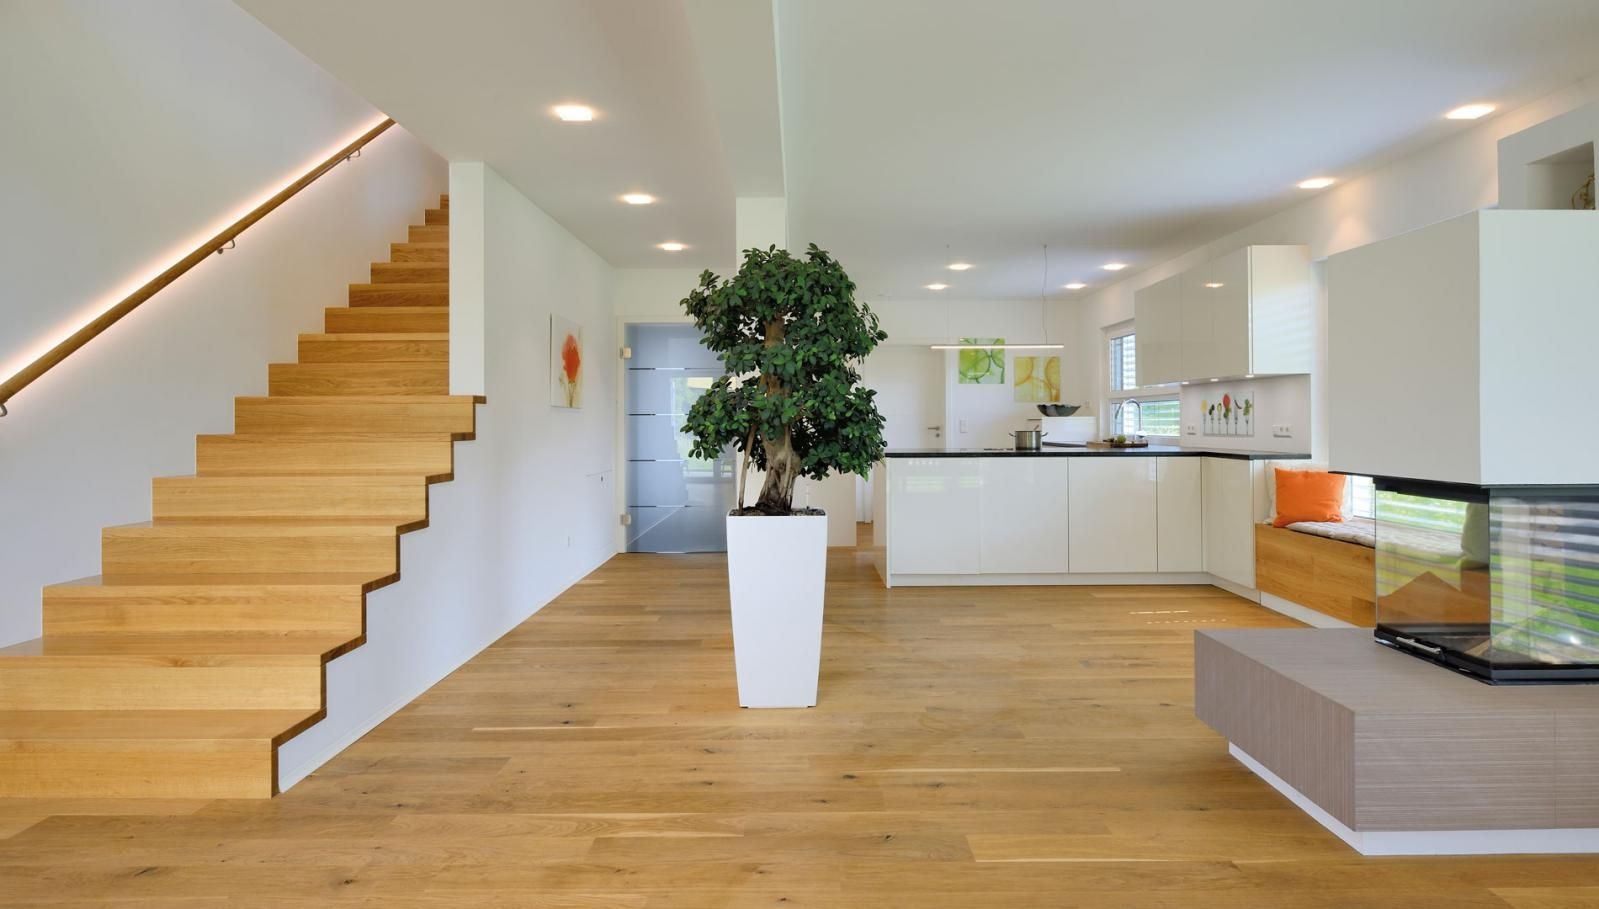 Aufgesattelte Wangentreppe Mit Setzstufen | Blickfang Mit Design